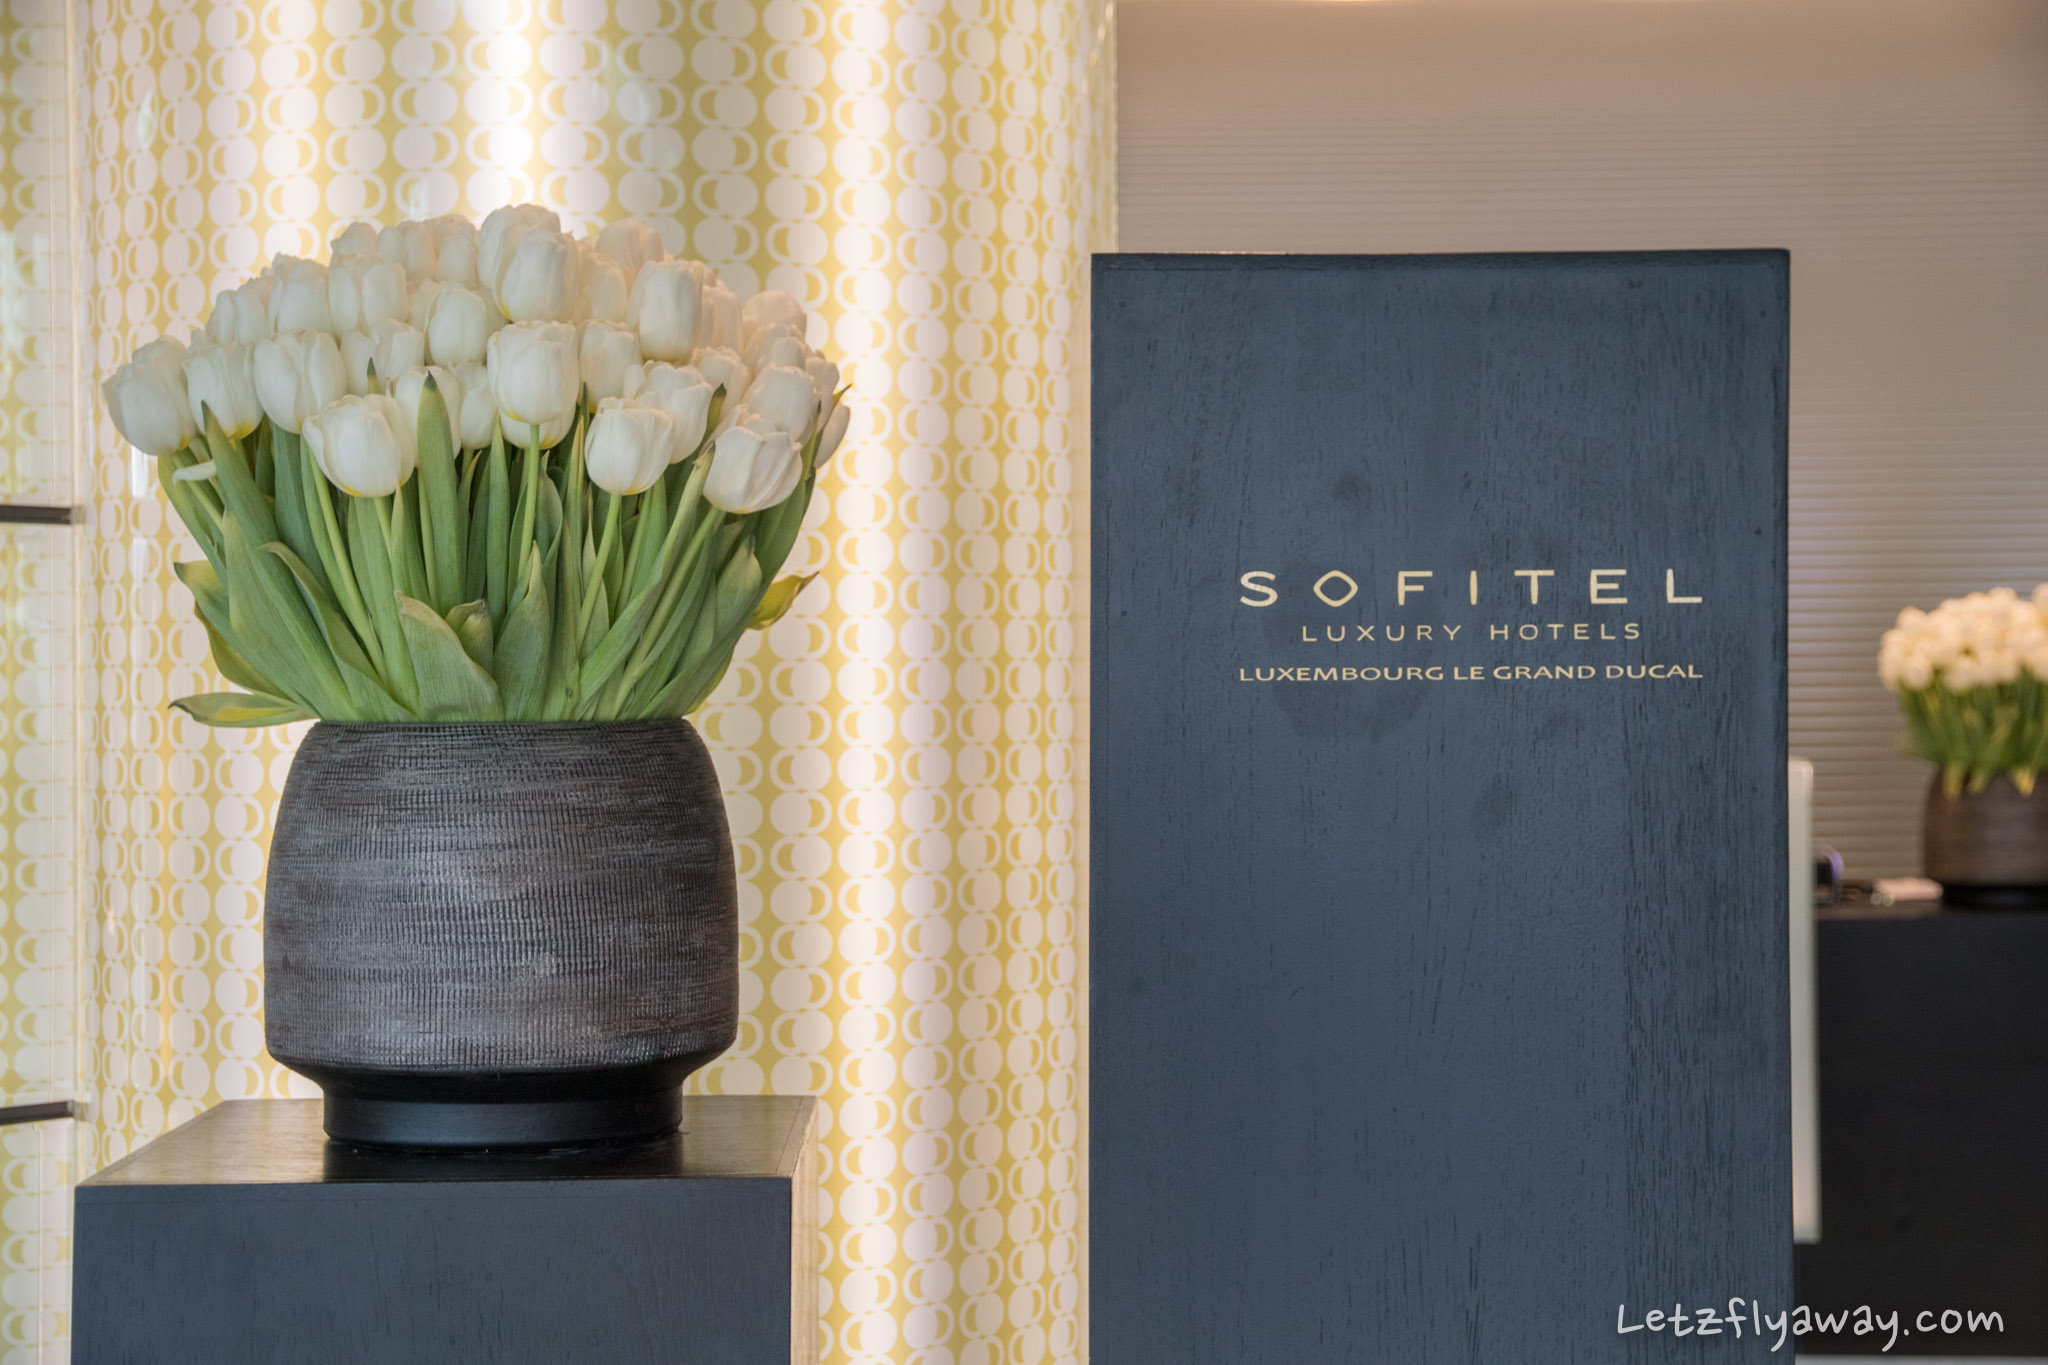 Sofitel Le Grand Ducal lobby flowers